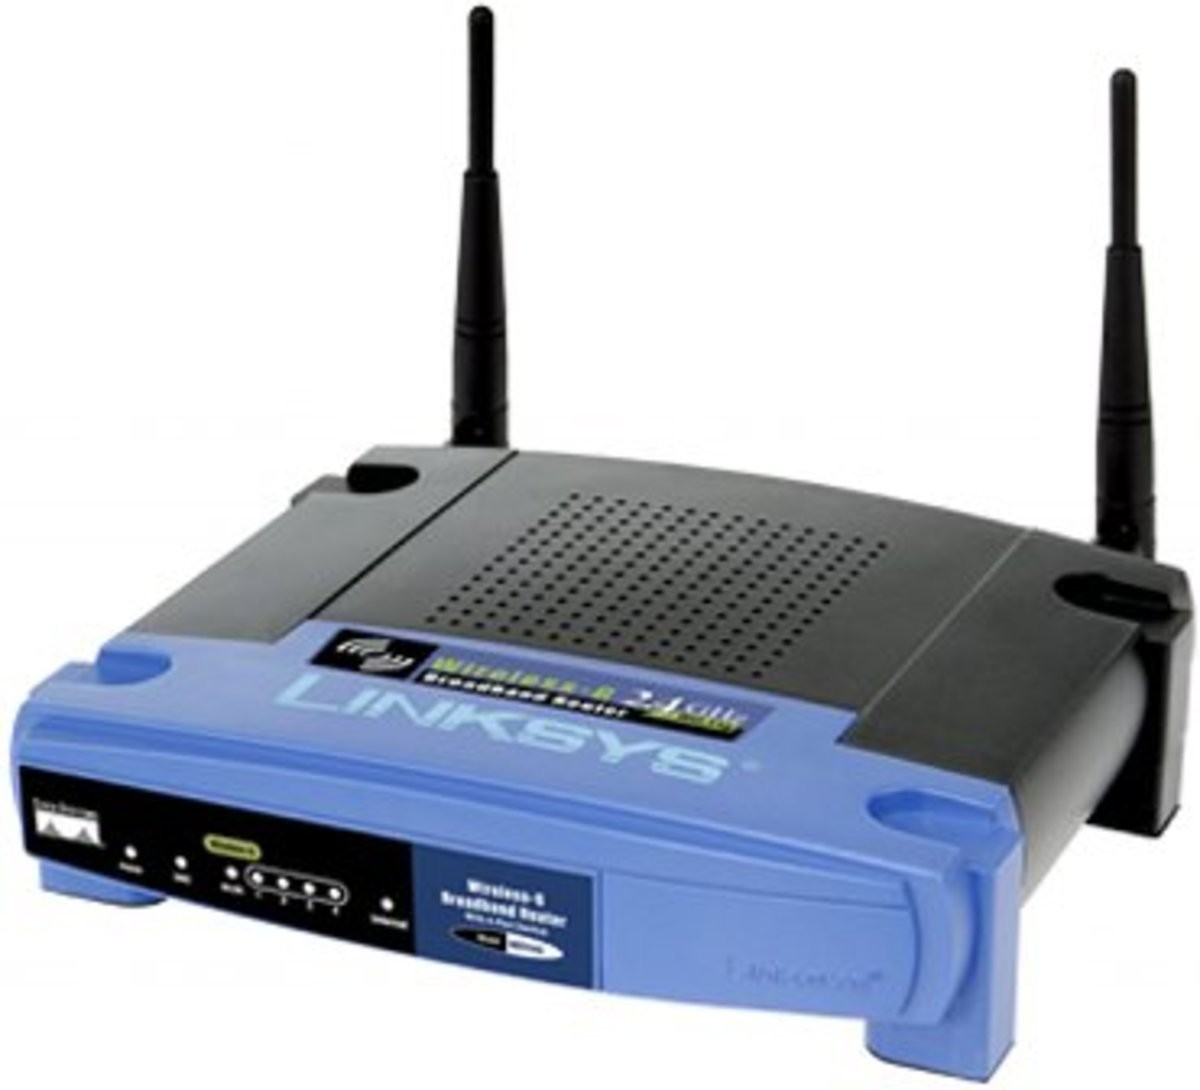 Wireless network Broadband router